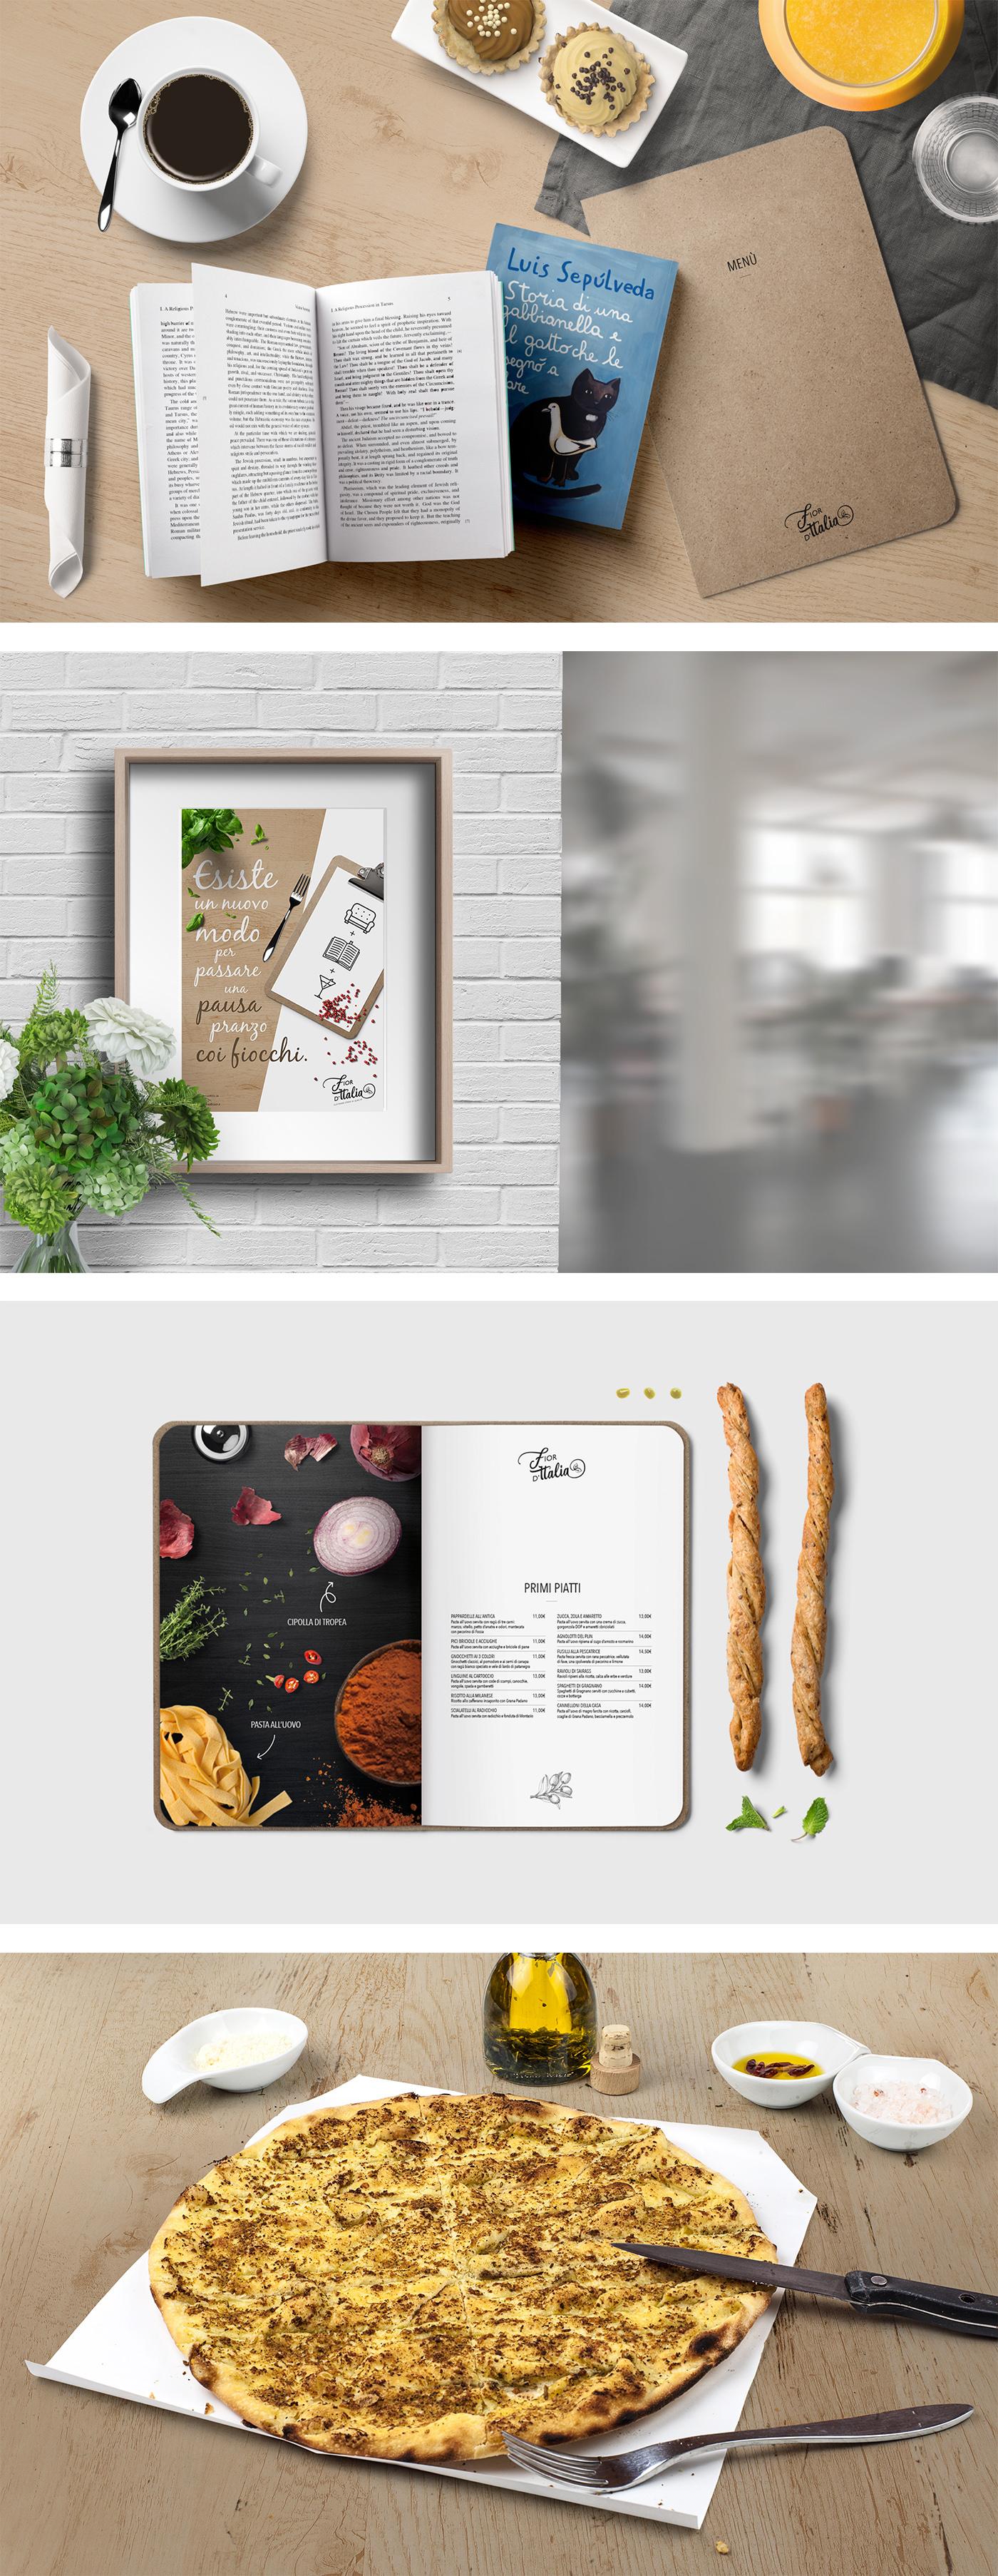 italian cuisine,italian restaurant,restaurant,gastronomy,Packaging,menu,Food ,Pasta,Quality,inspire